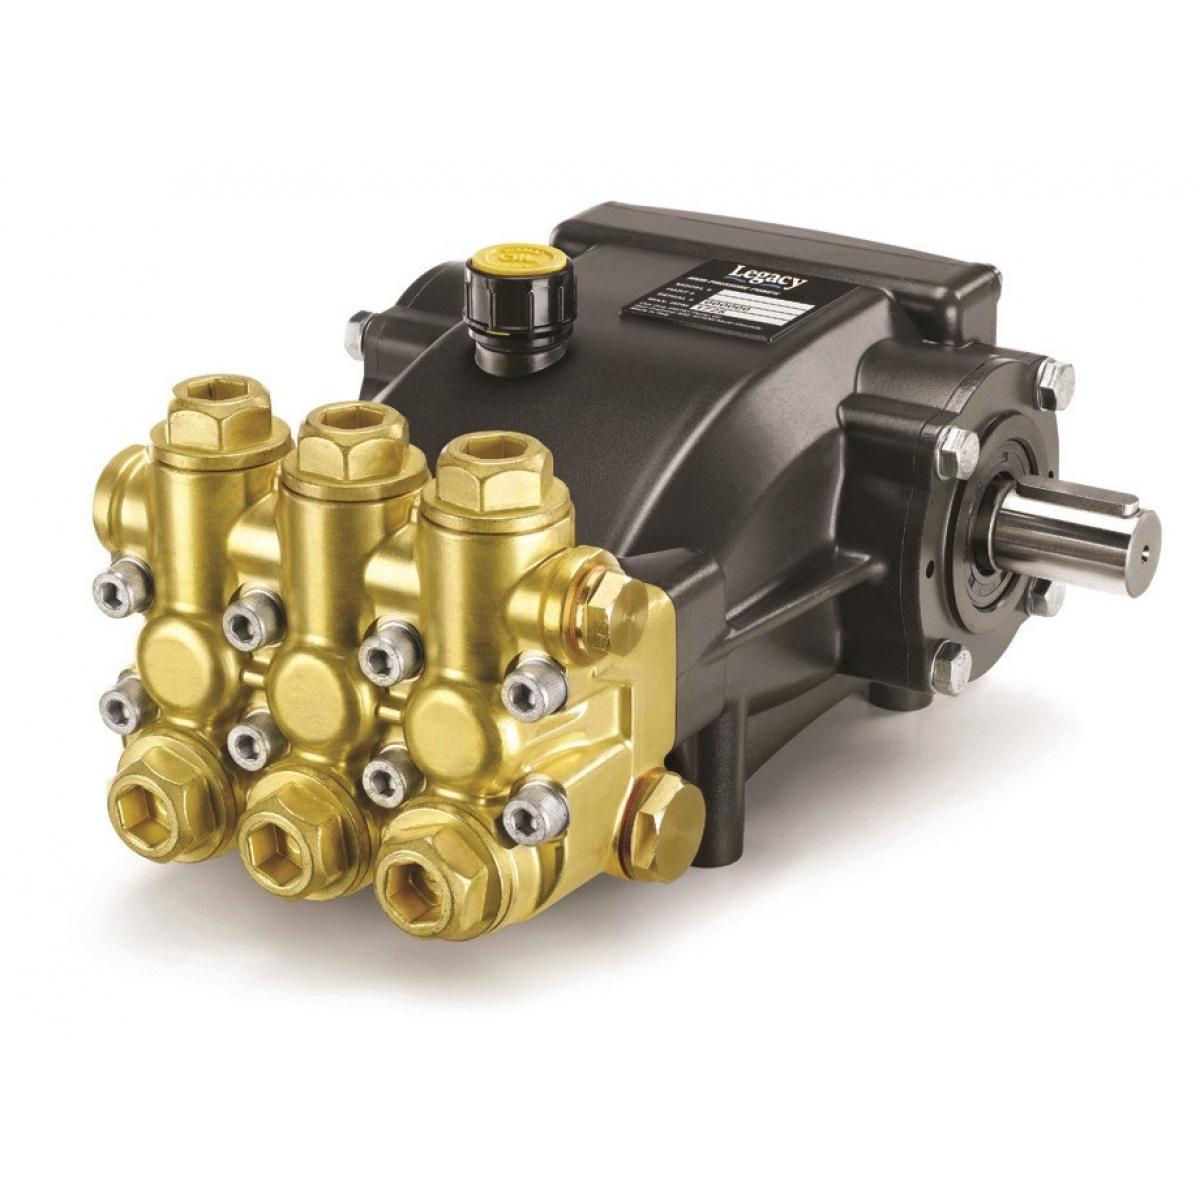 Pump, Legacy Gm5030l.3, 5.1@3000 1550rpm